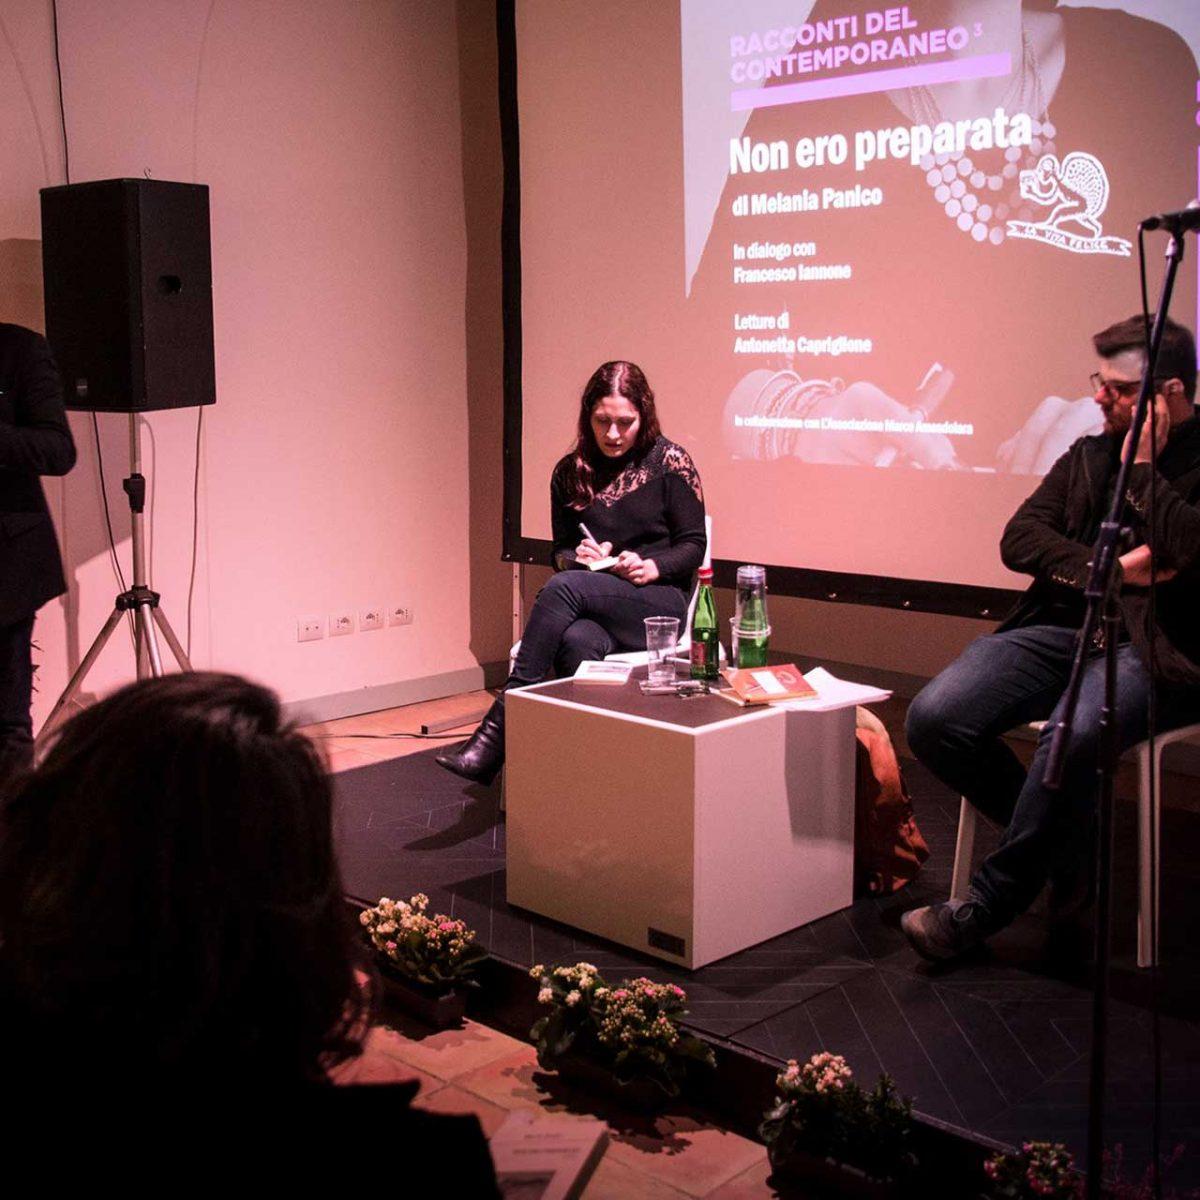 La poetessa Melania Panico con Francesco Iannone e Antonetta Capriglione - Foto © Govanna Landi